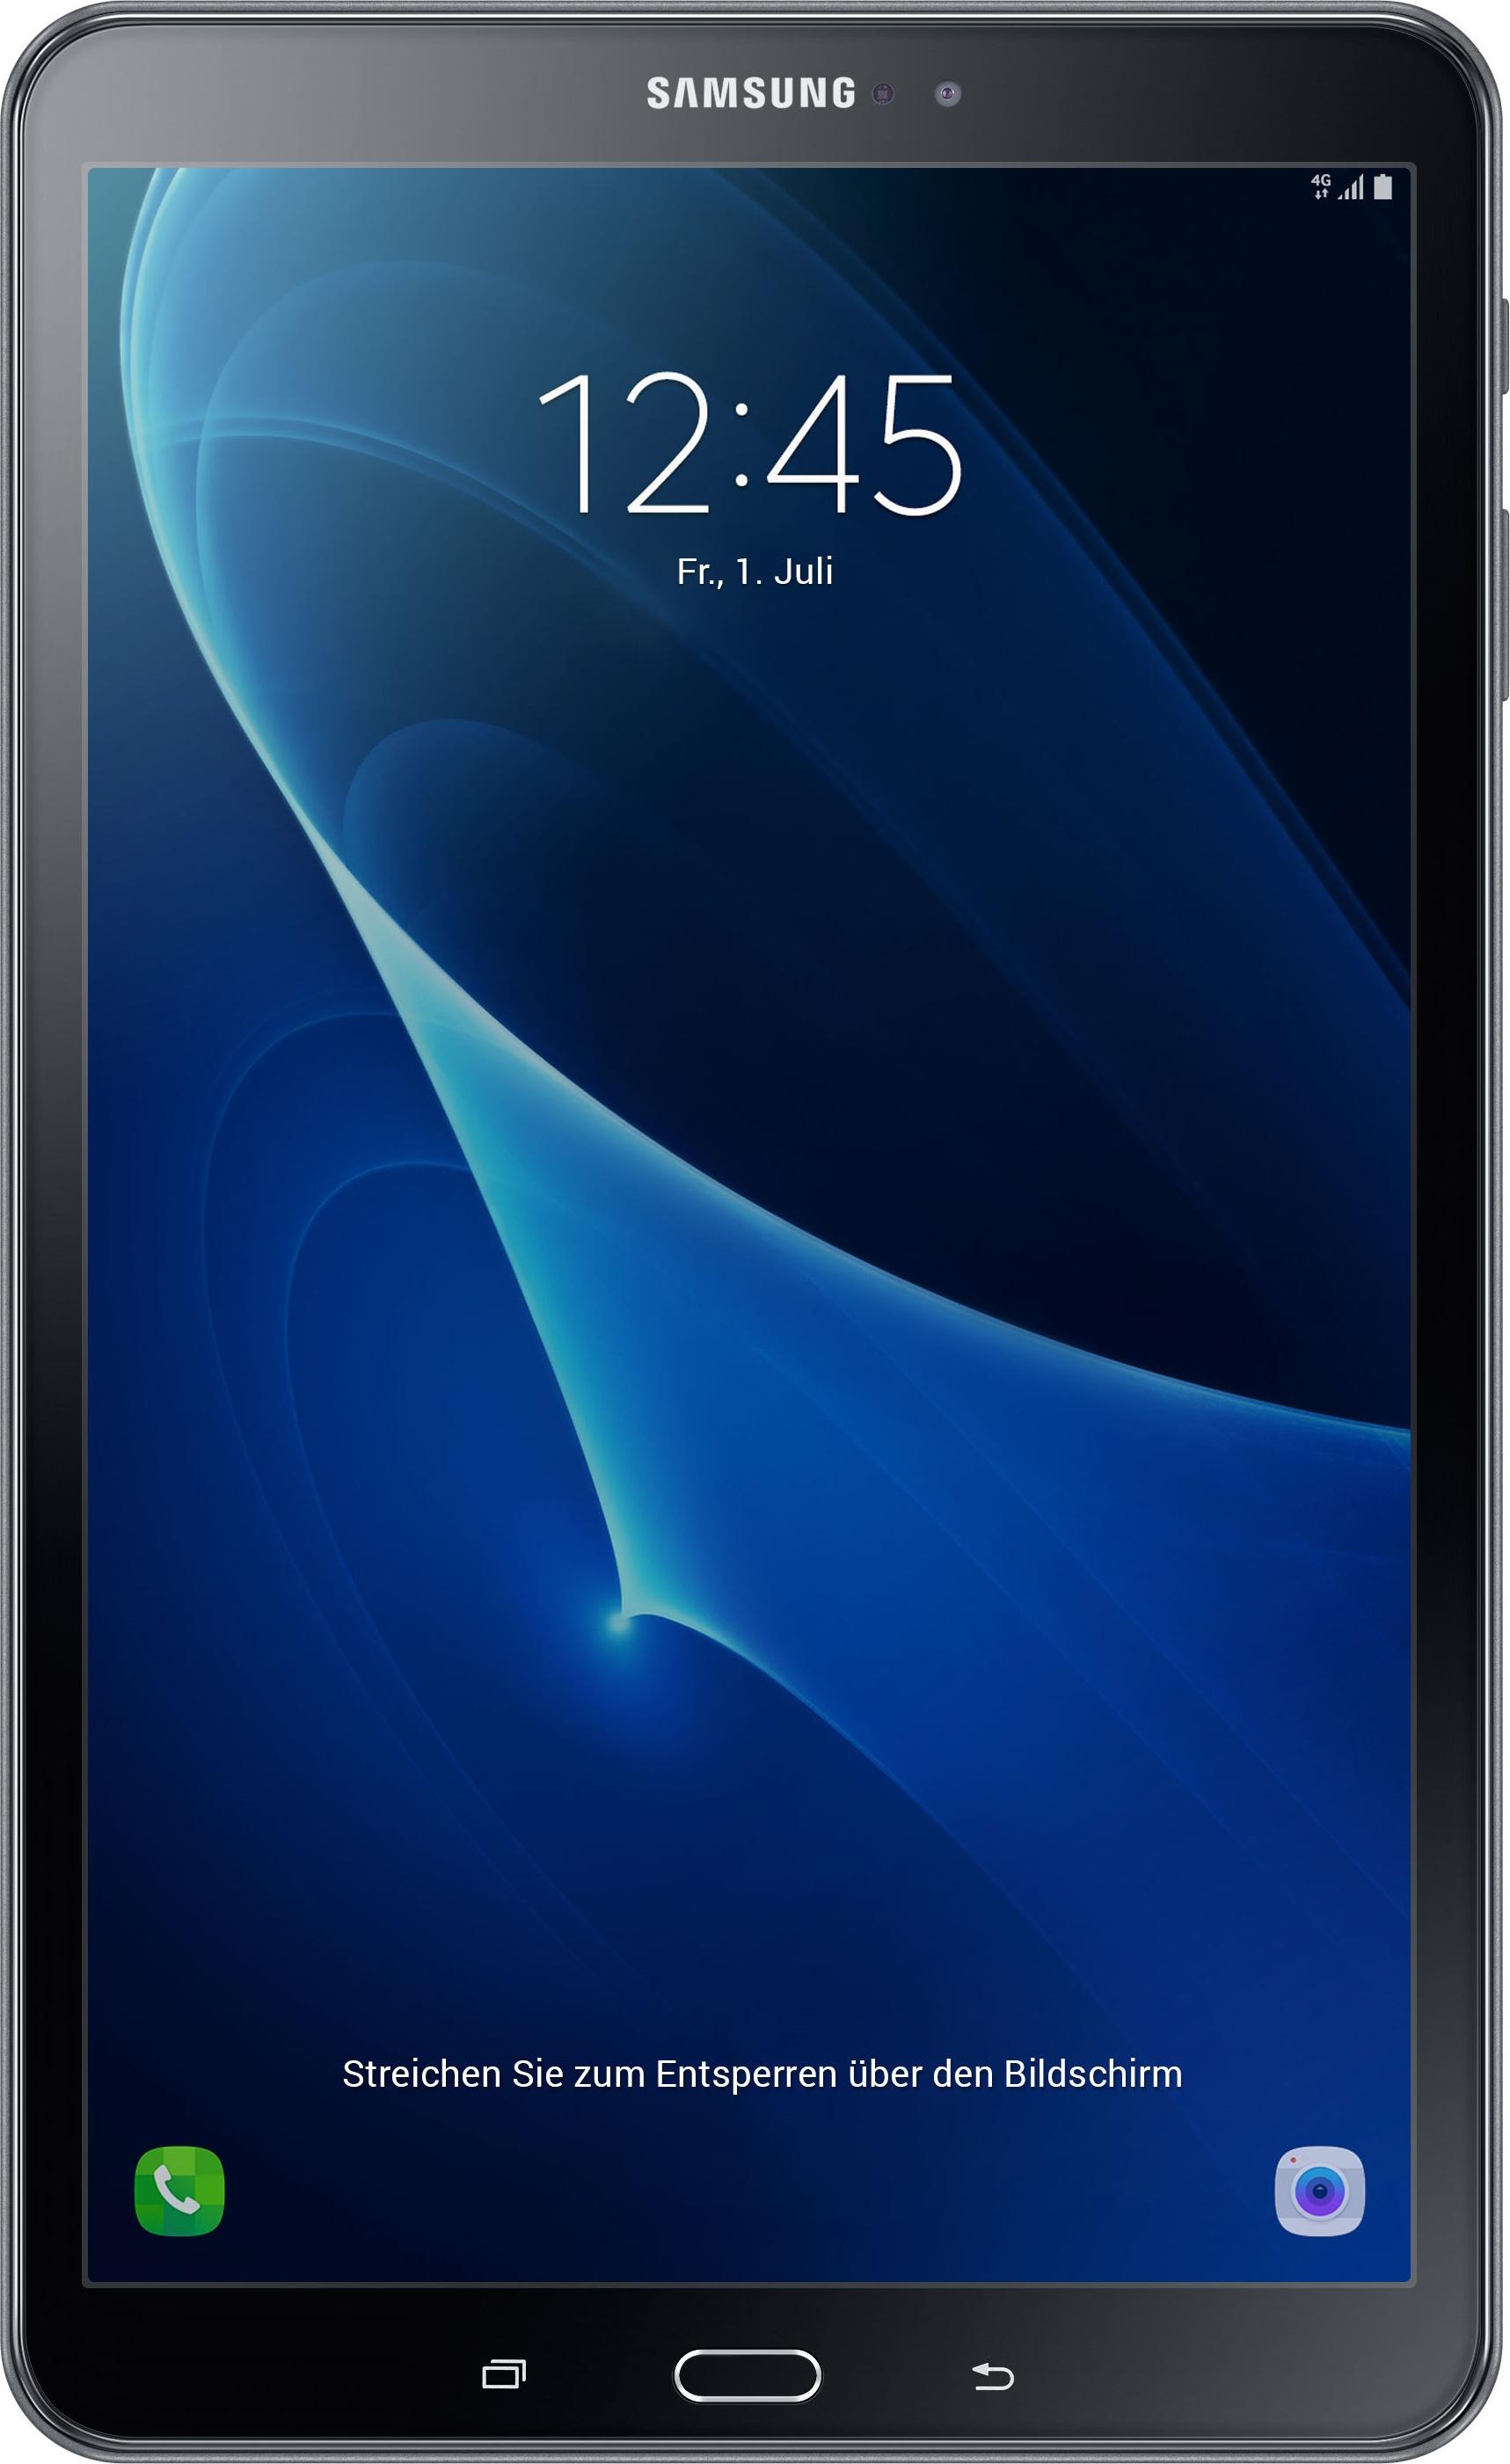 Samsung galaxy tab a 10 1 un cran full hd et un for Photo ecran galaxy tab 3